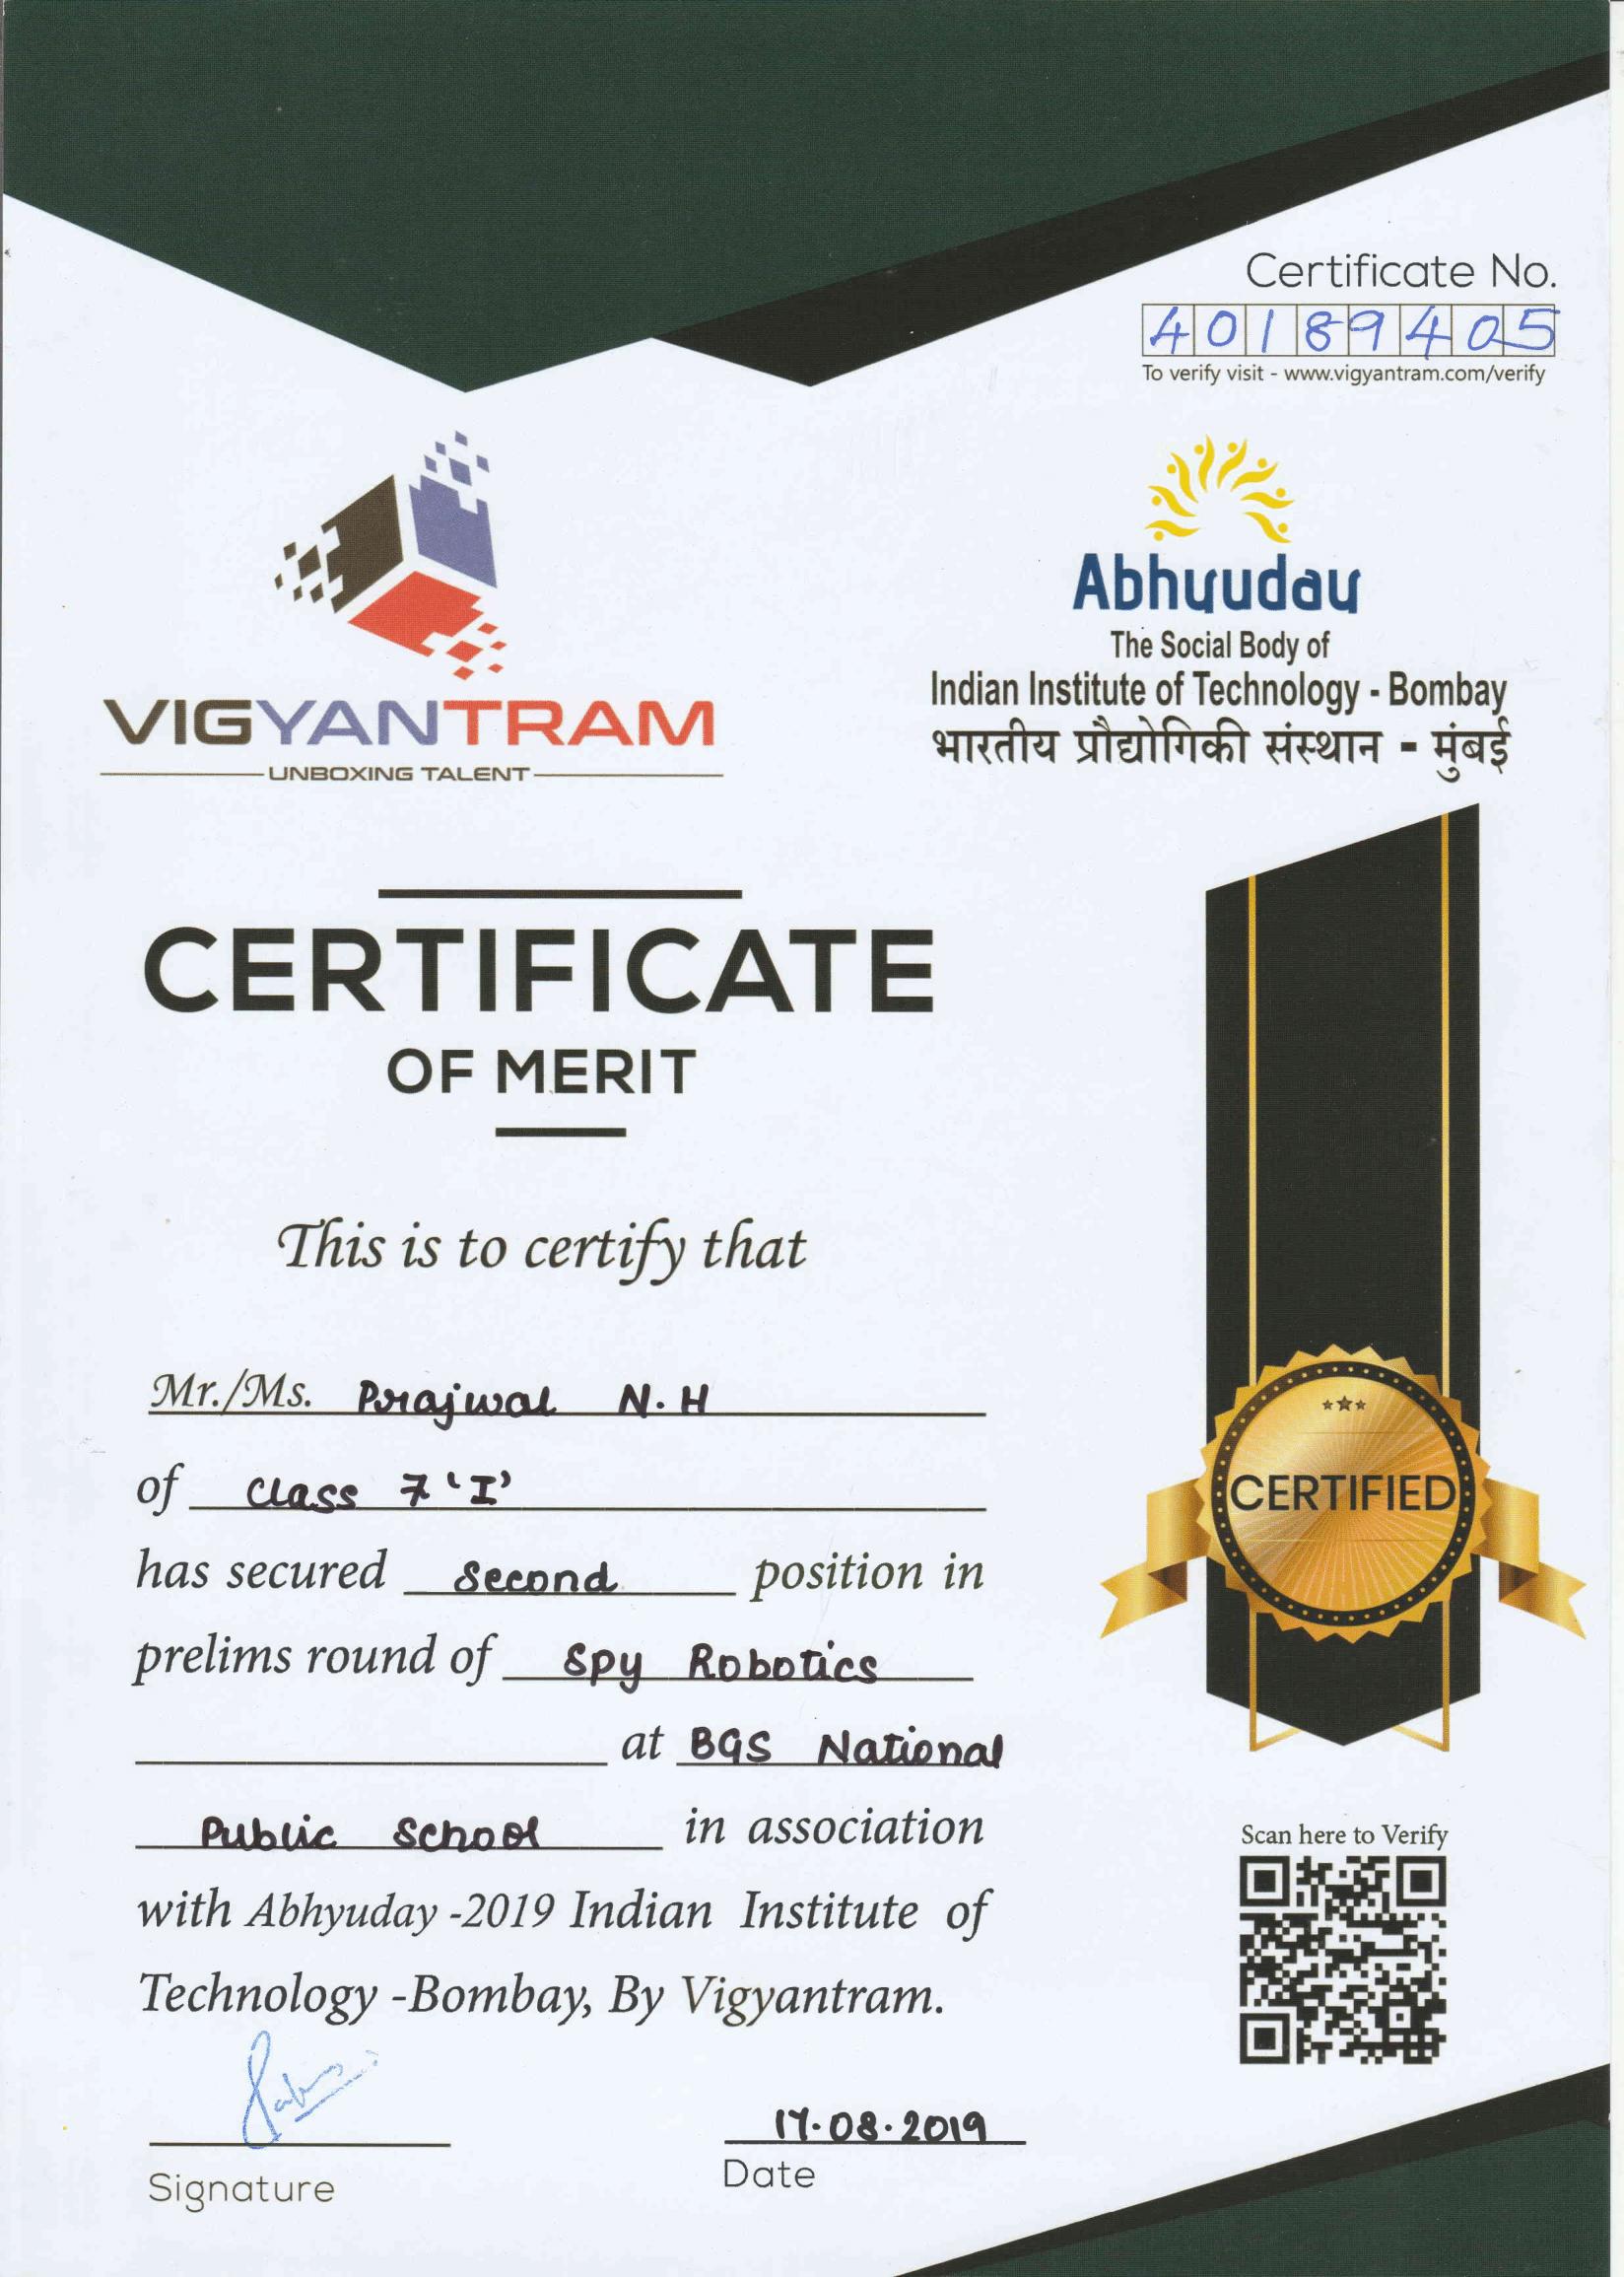 Vigyantram Merit Certificate